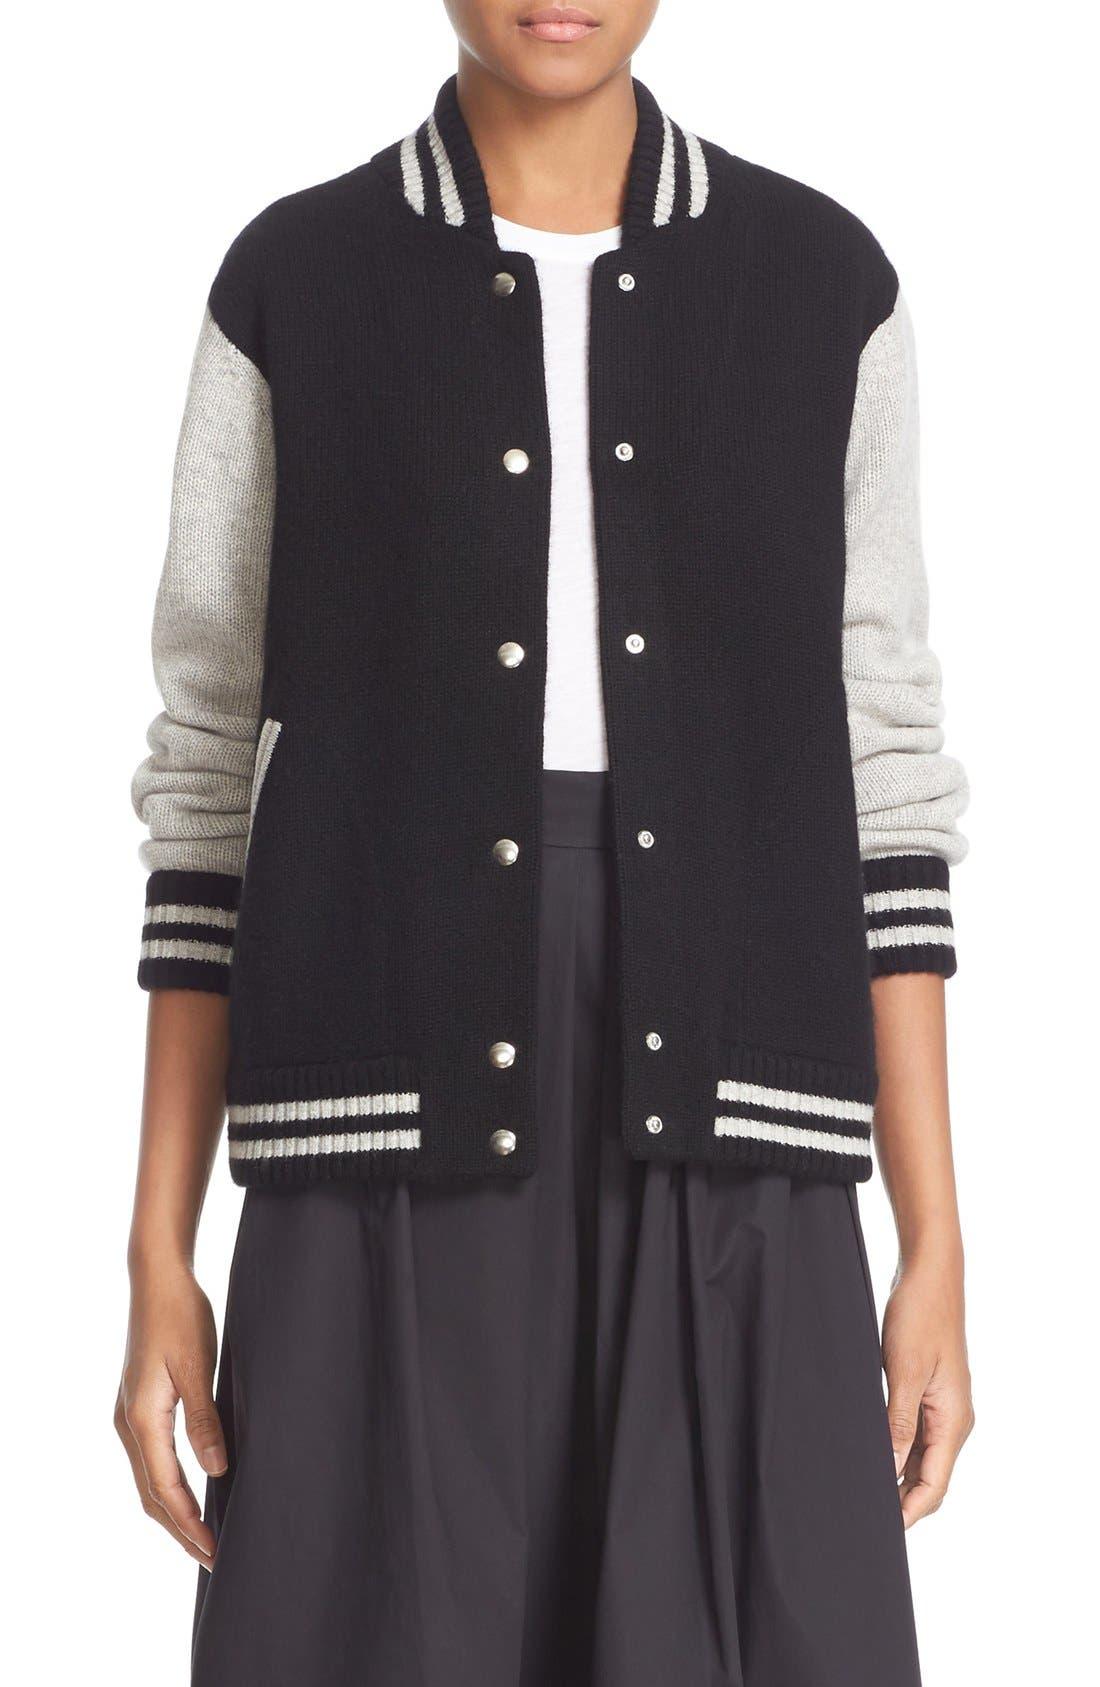 Stripe Detail Wool & Cashmere Knit Varsity Jacket,                         Main,                         color, Black